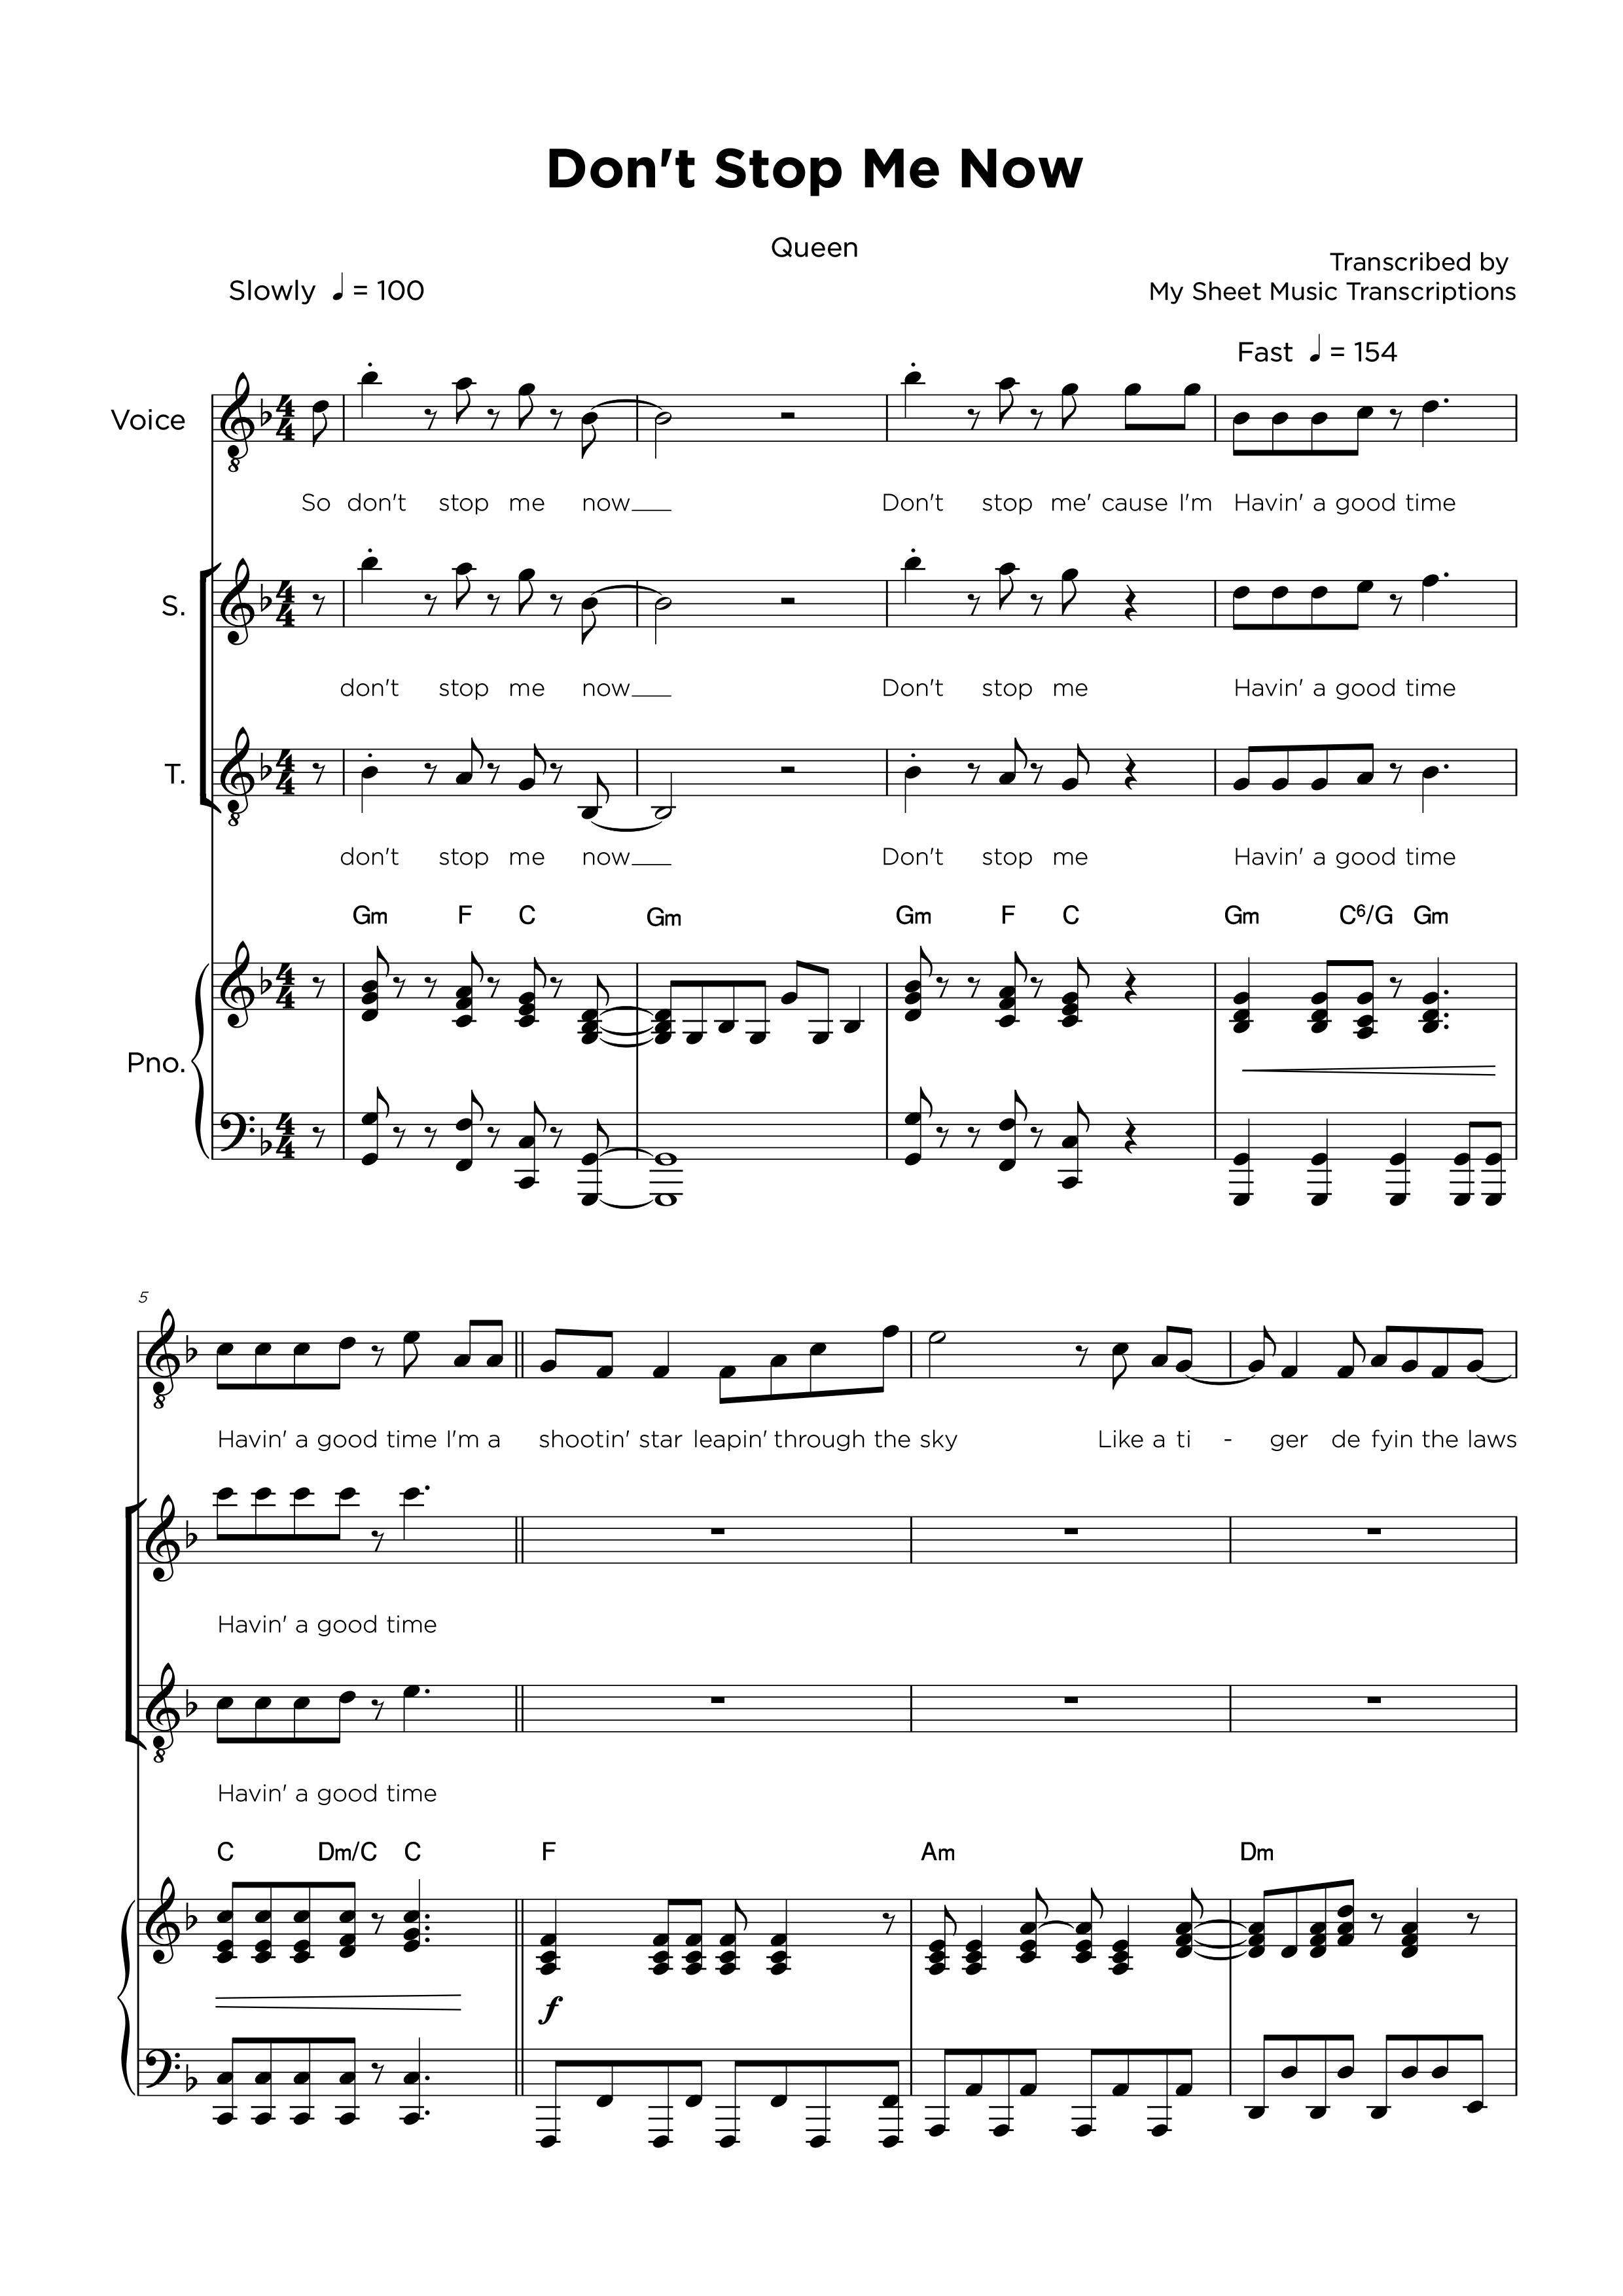 Don't Stop Me Now - Queen - Partitura para piano y vocal